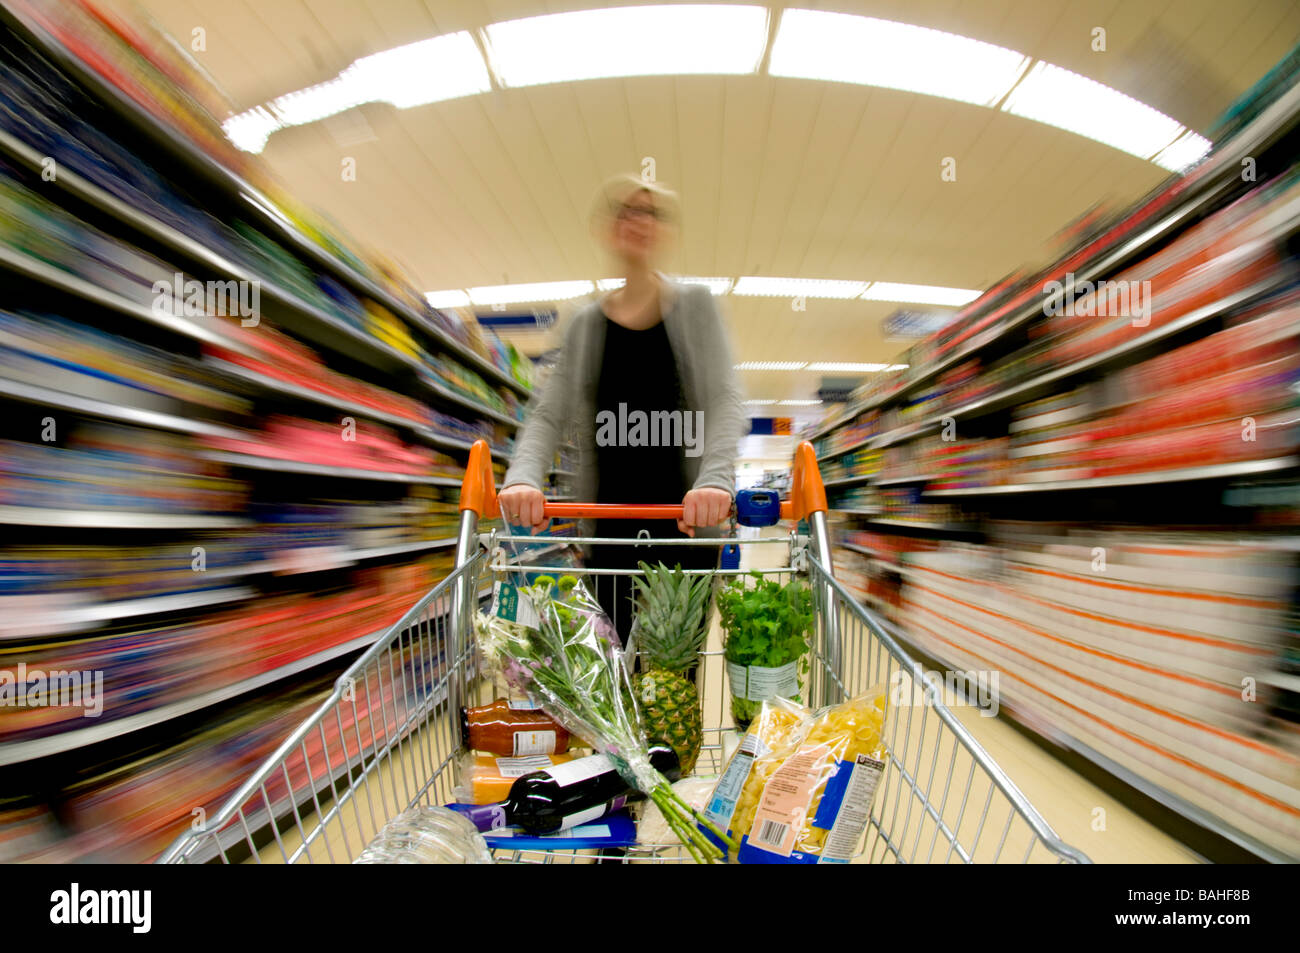 Women Pushing Trolley, Supermarket Shopping, UK - Stock Image